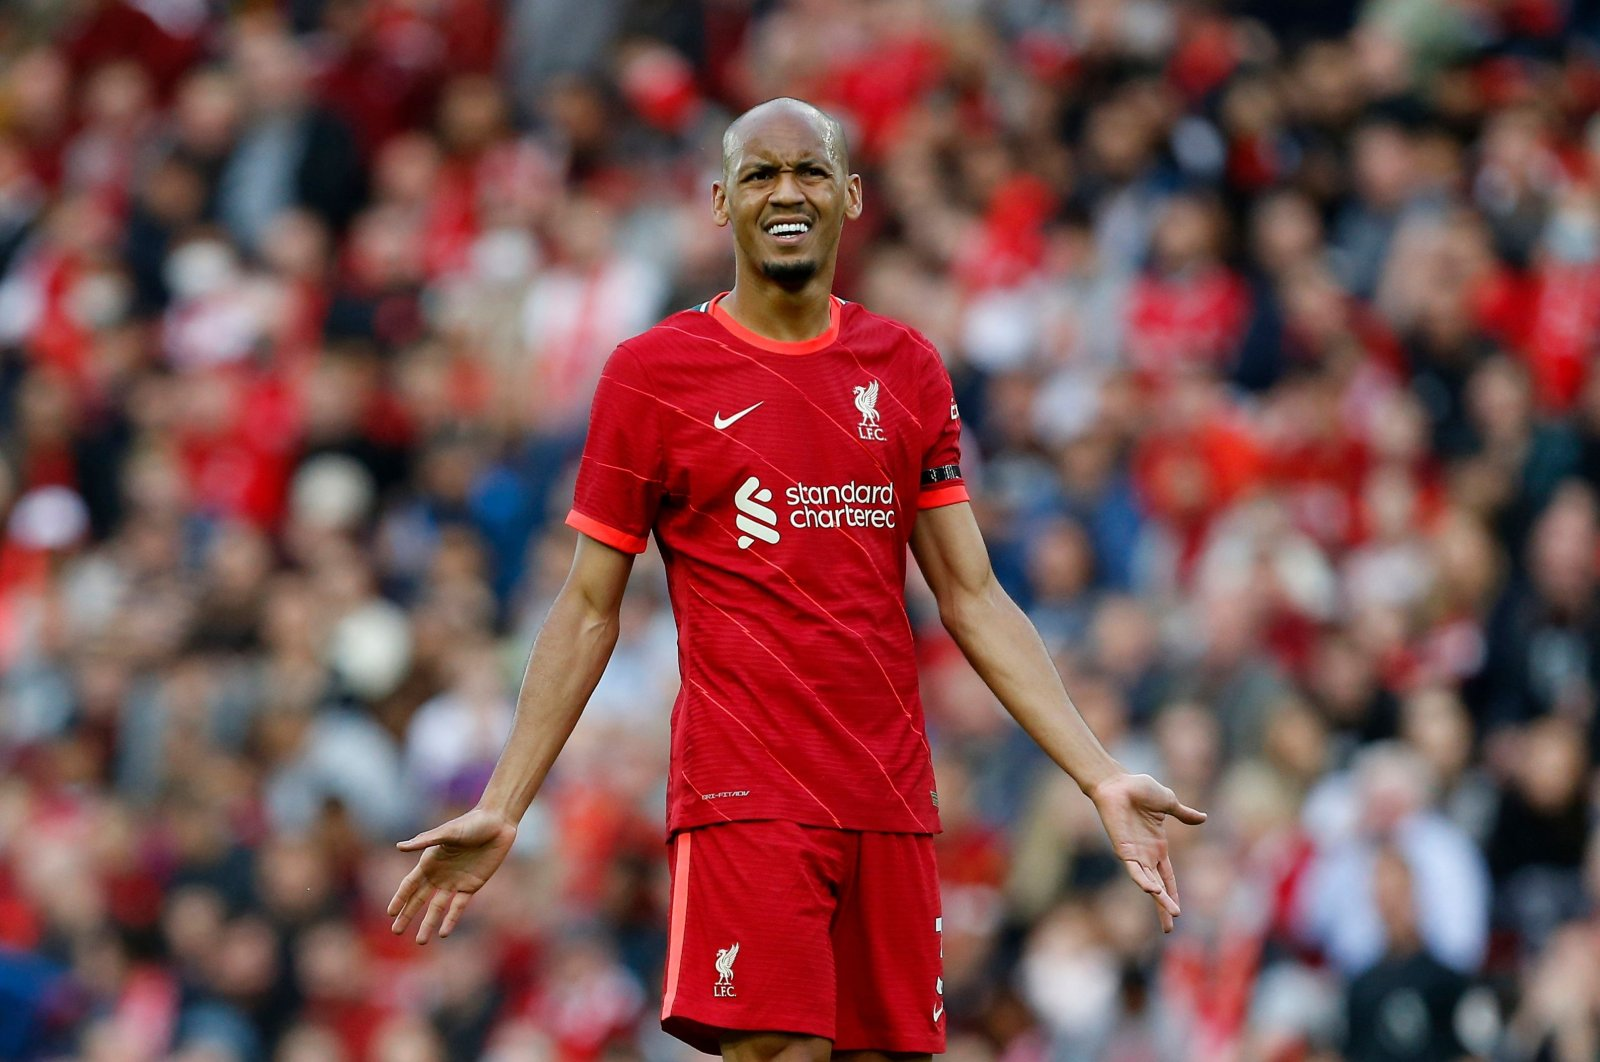 Liverpool's Brazilian midfielder Fabinho reacts during a friendly match against Osasuna, Anfield, Liverpool, Britain, Aug. 9, 2021. (Reuters Photo)